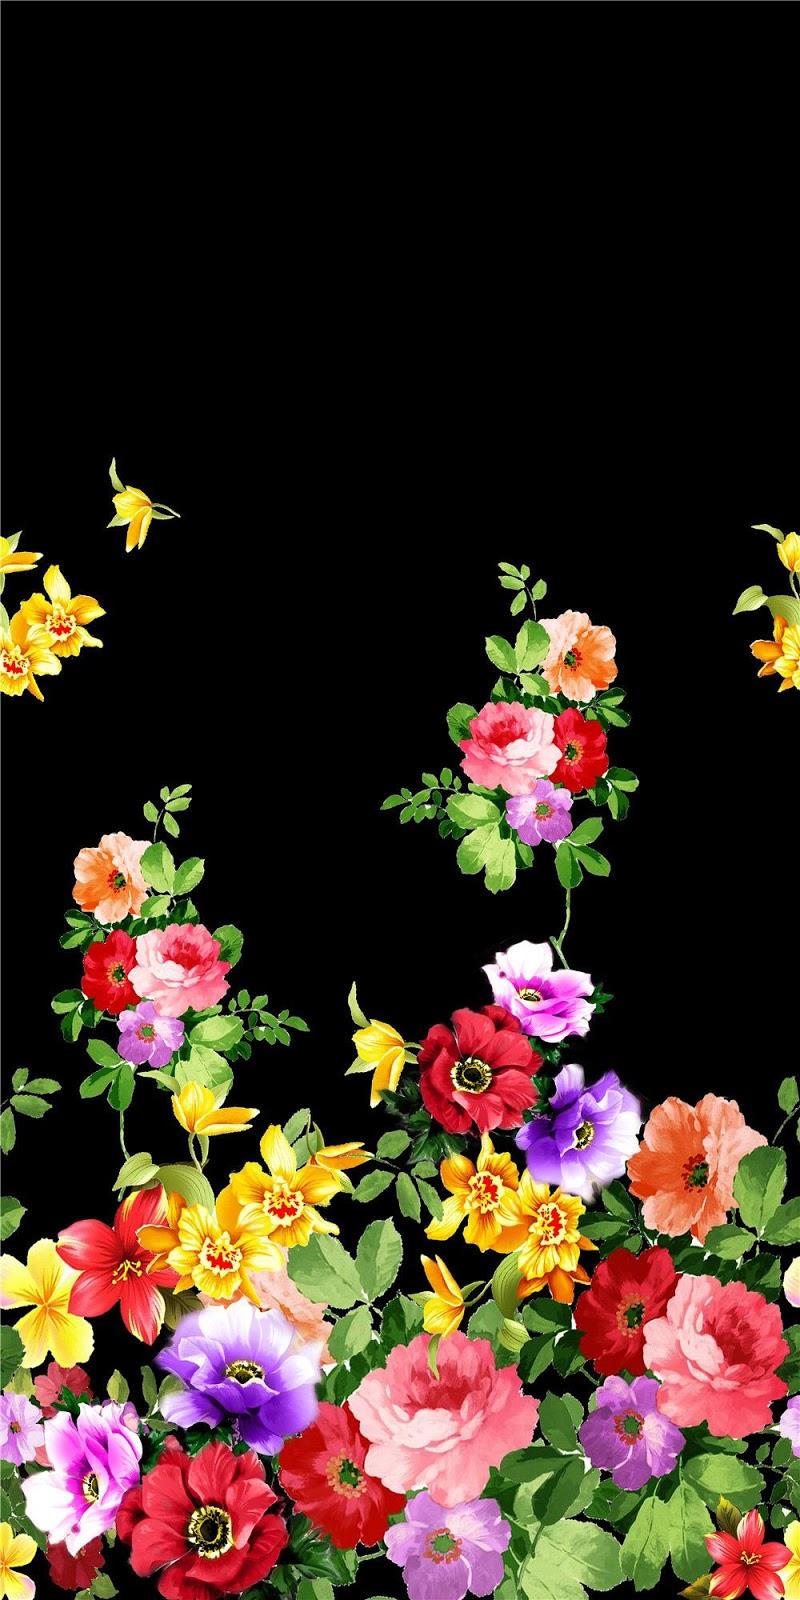 Animal Print Wallpaper Border Painting Flower Design Digital Print 2 Joy Design Studio